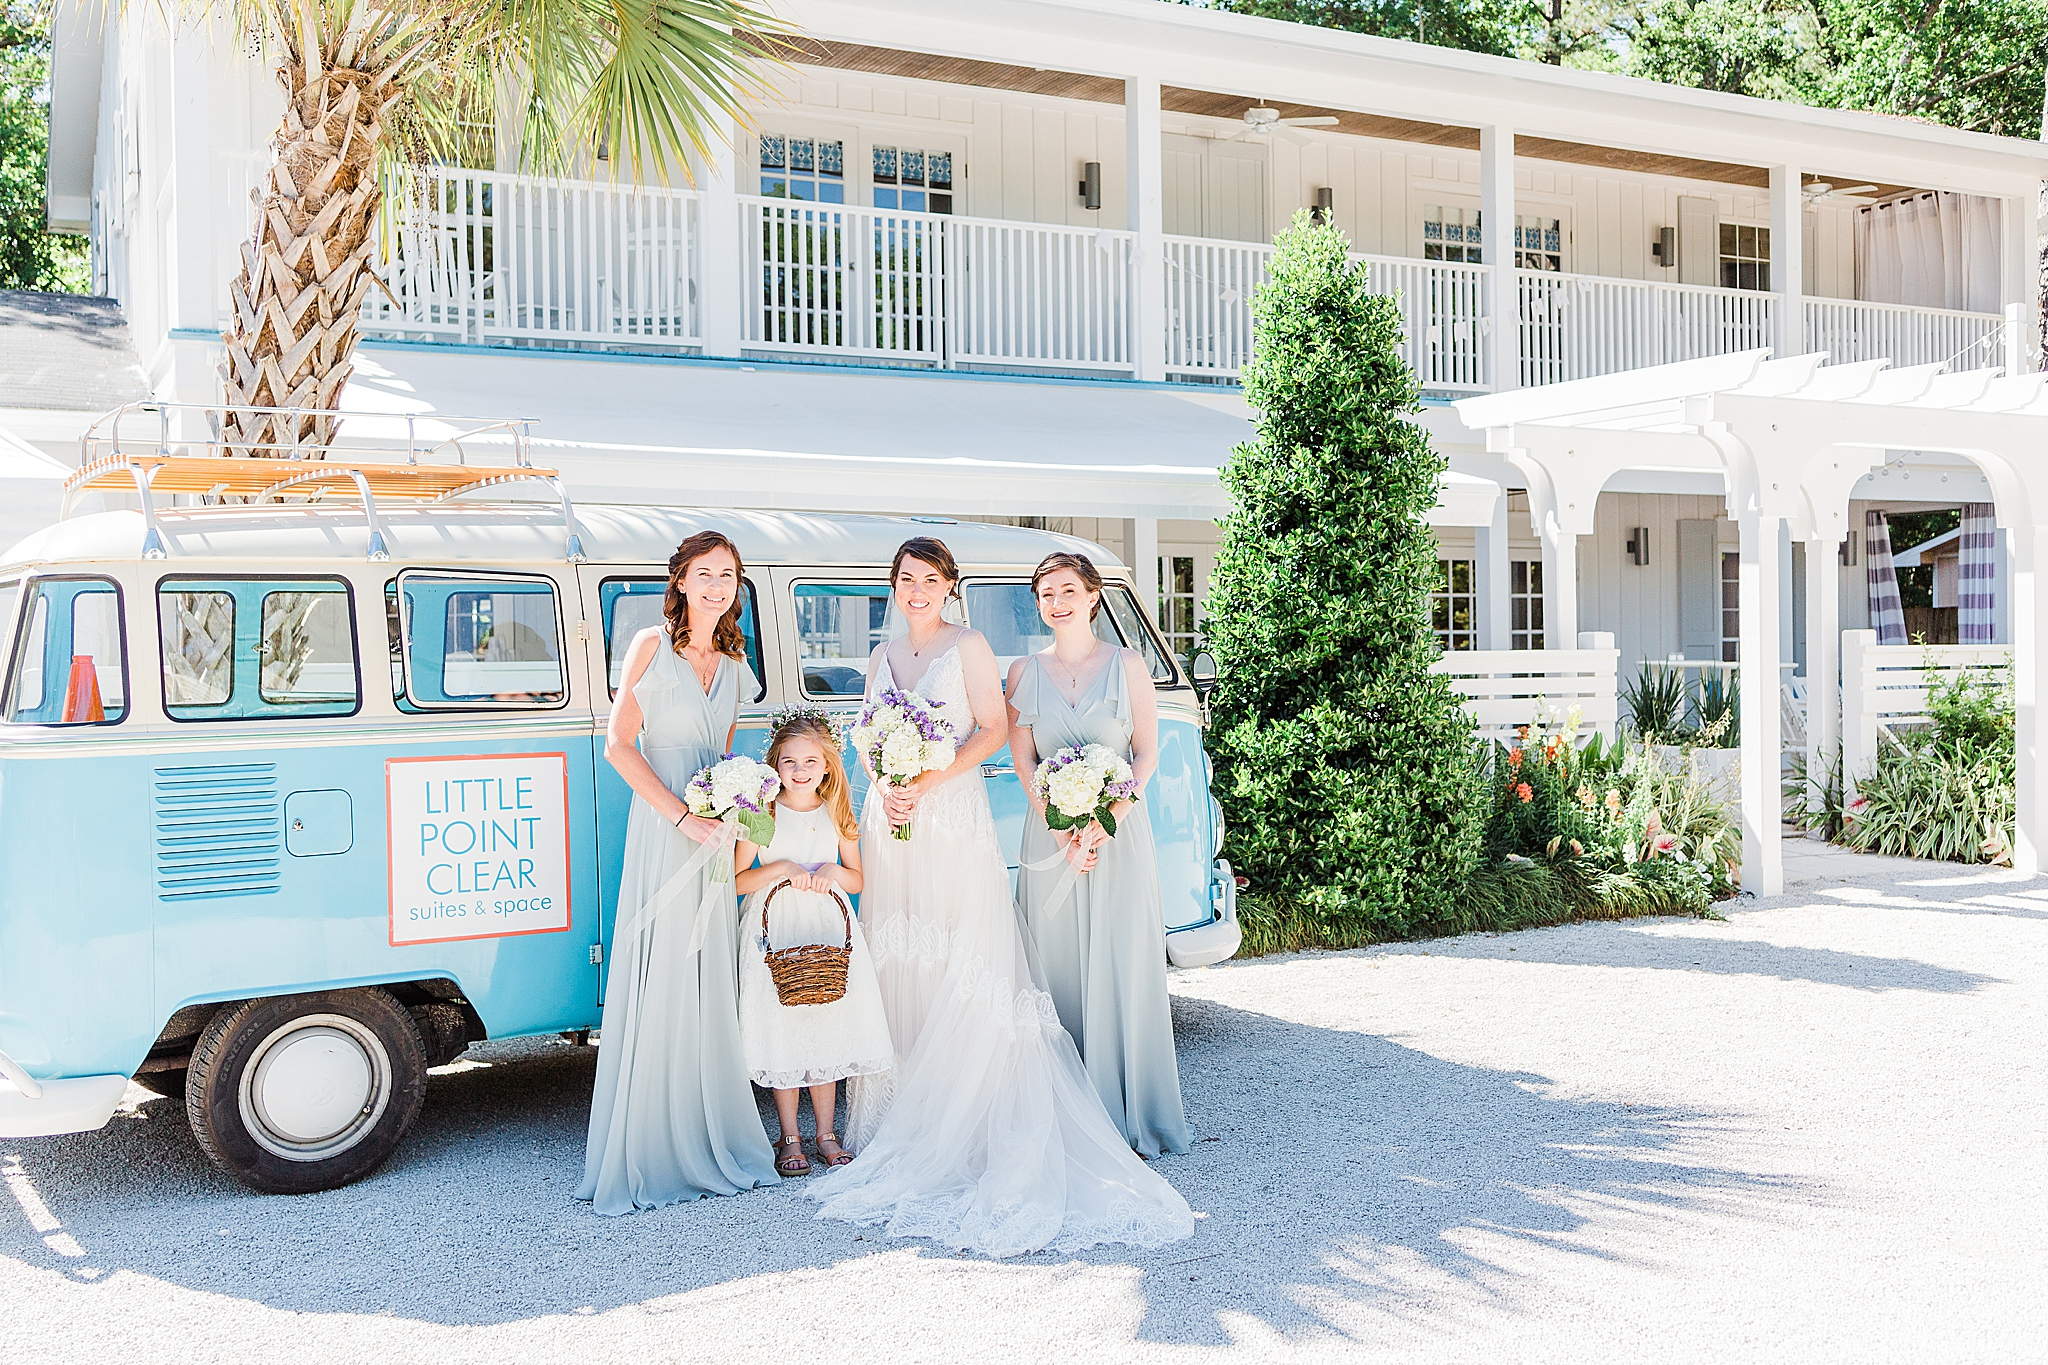 bride and bridesmaids pose by VW van